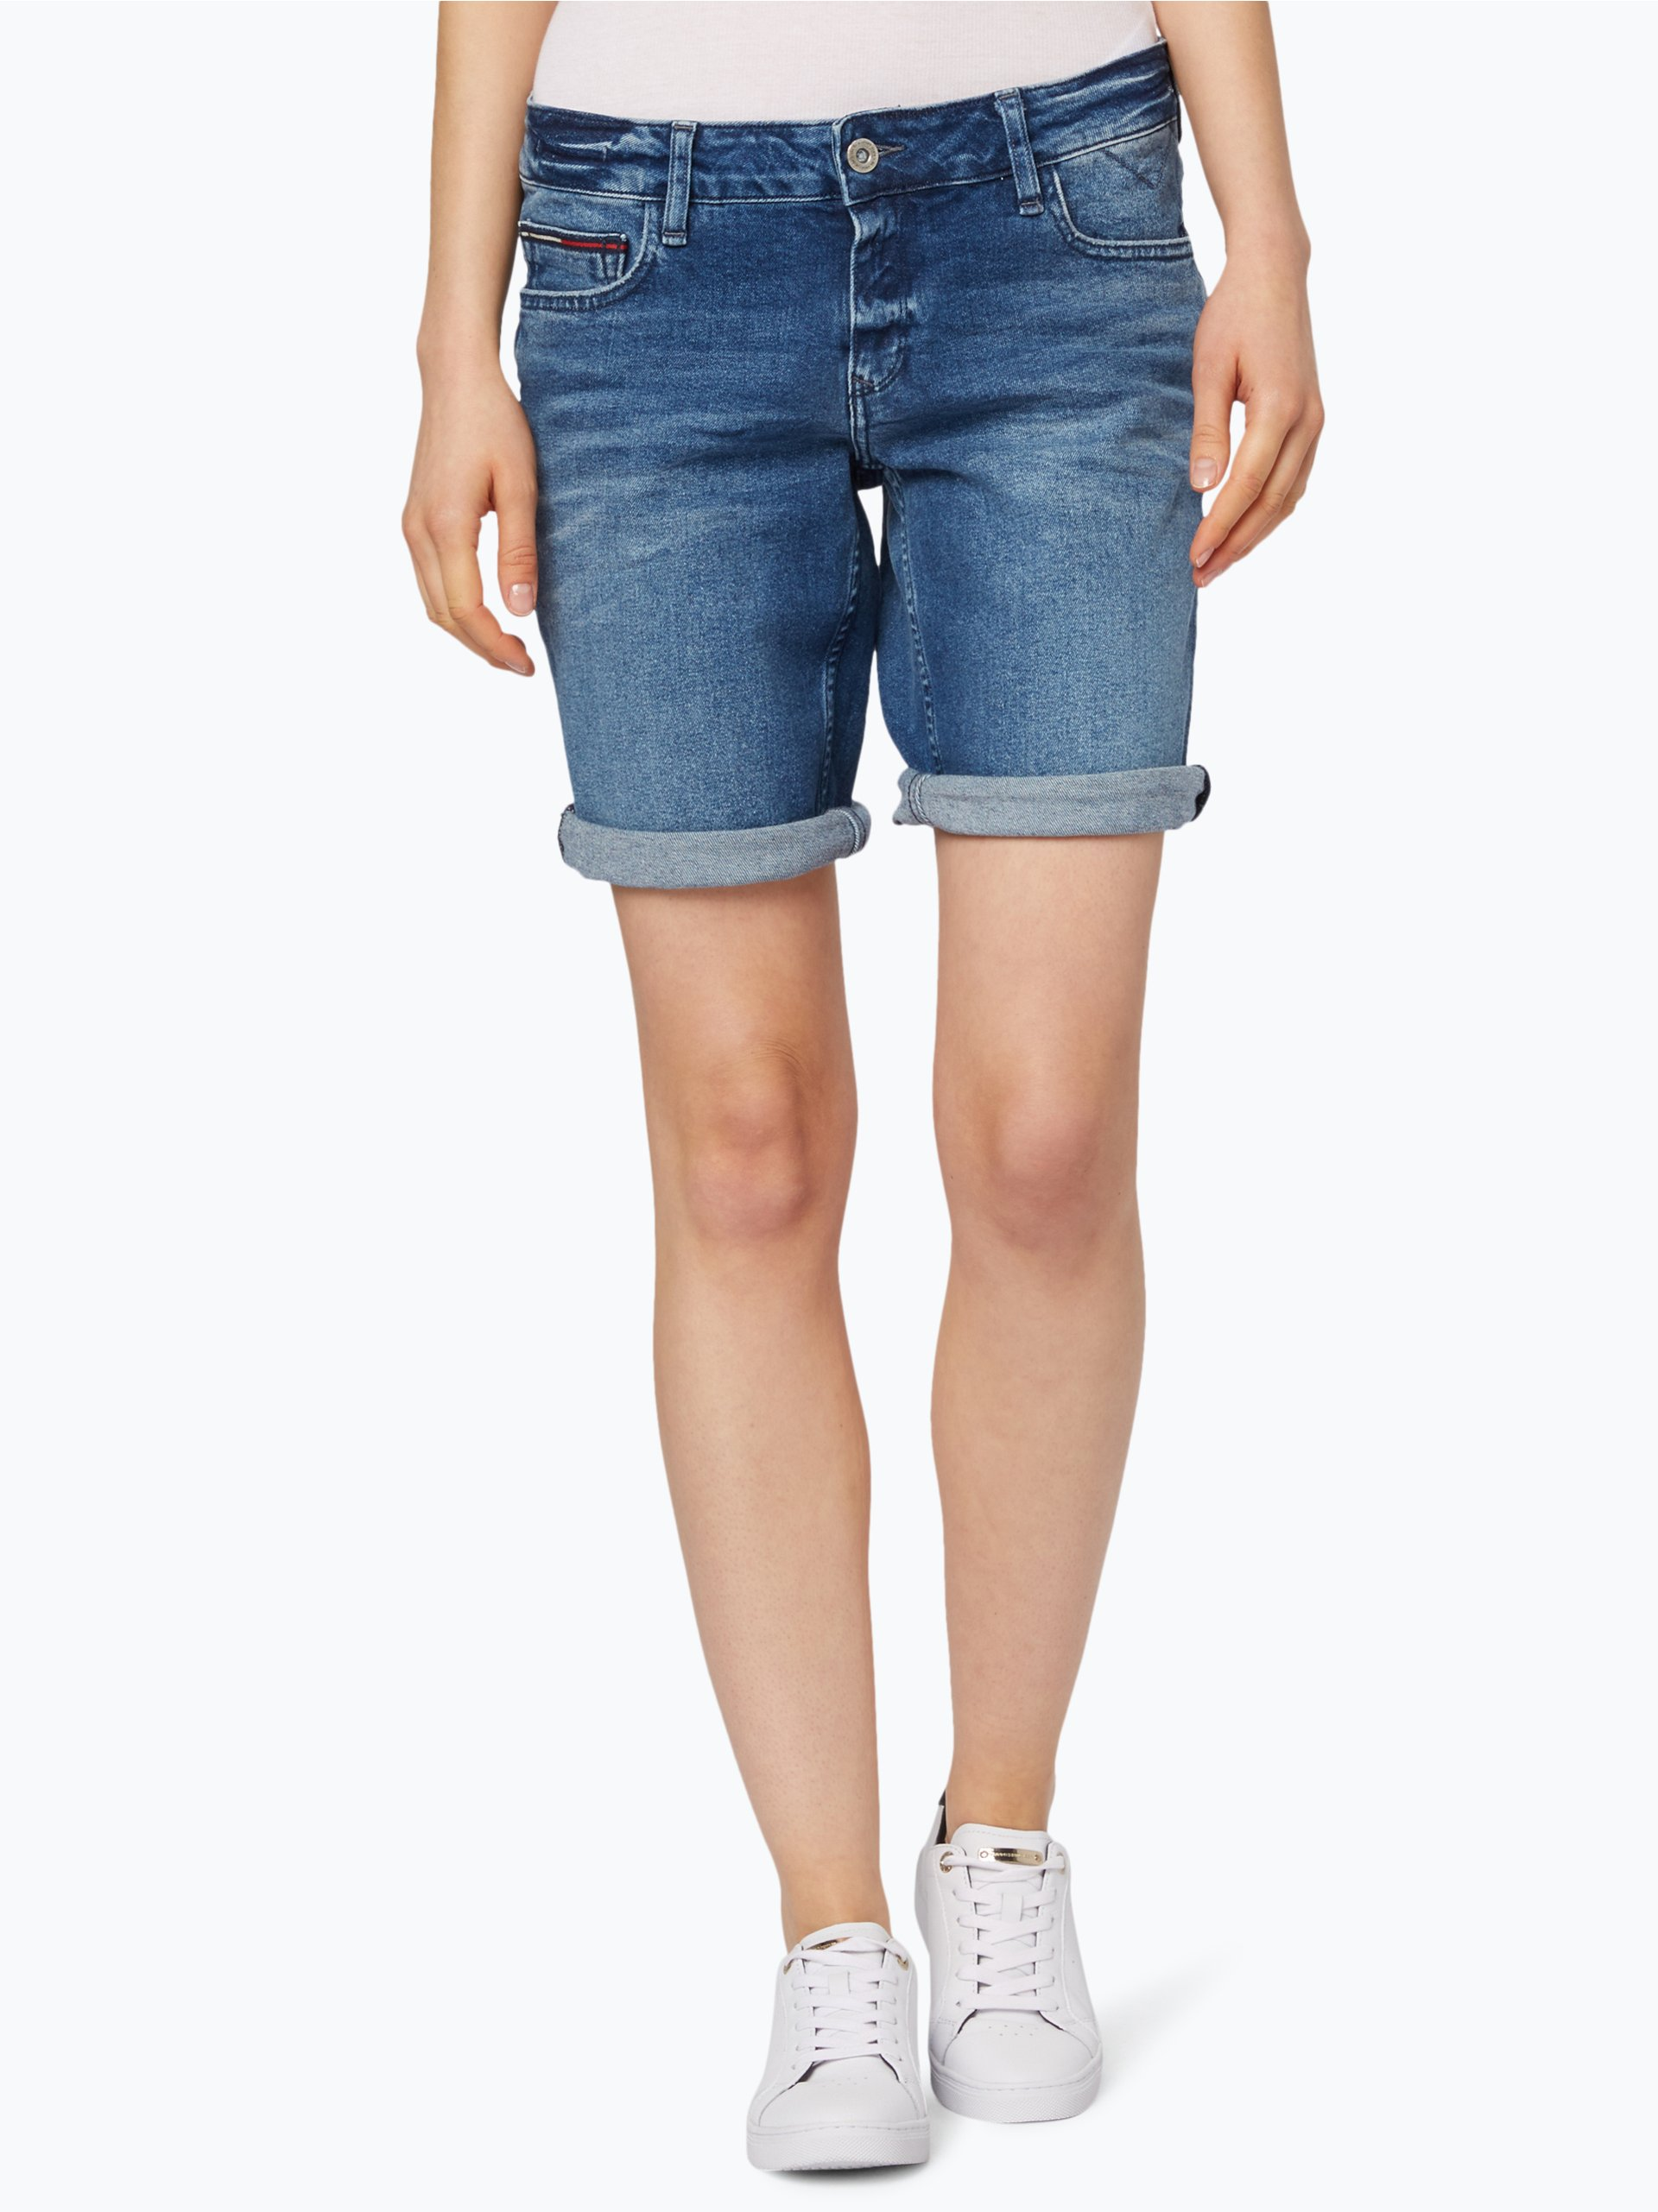 tommy jeans damen shorts online kaufen peek und. Black Bedroom Furniture Sets. Home Design Ideas